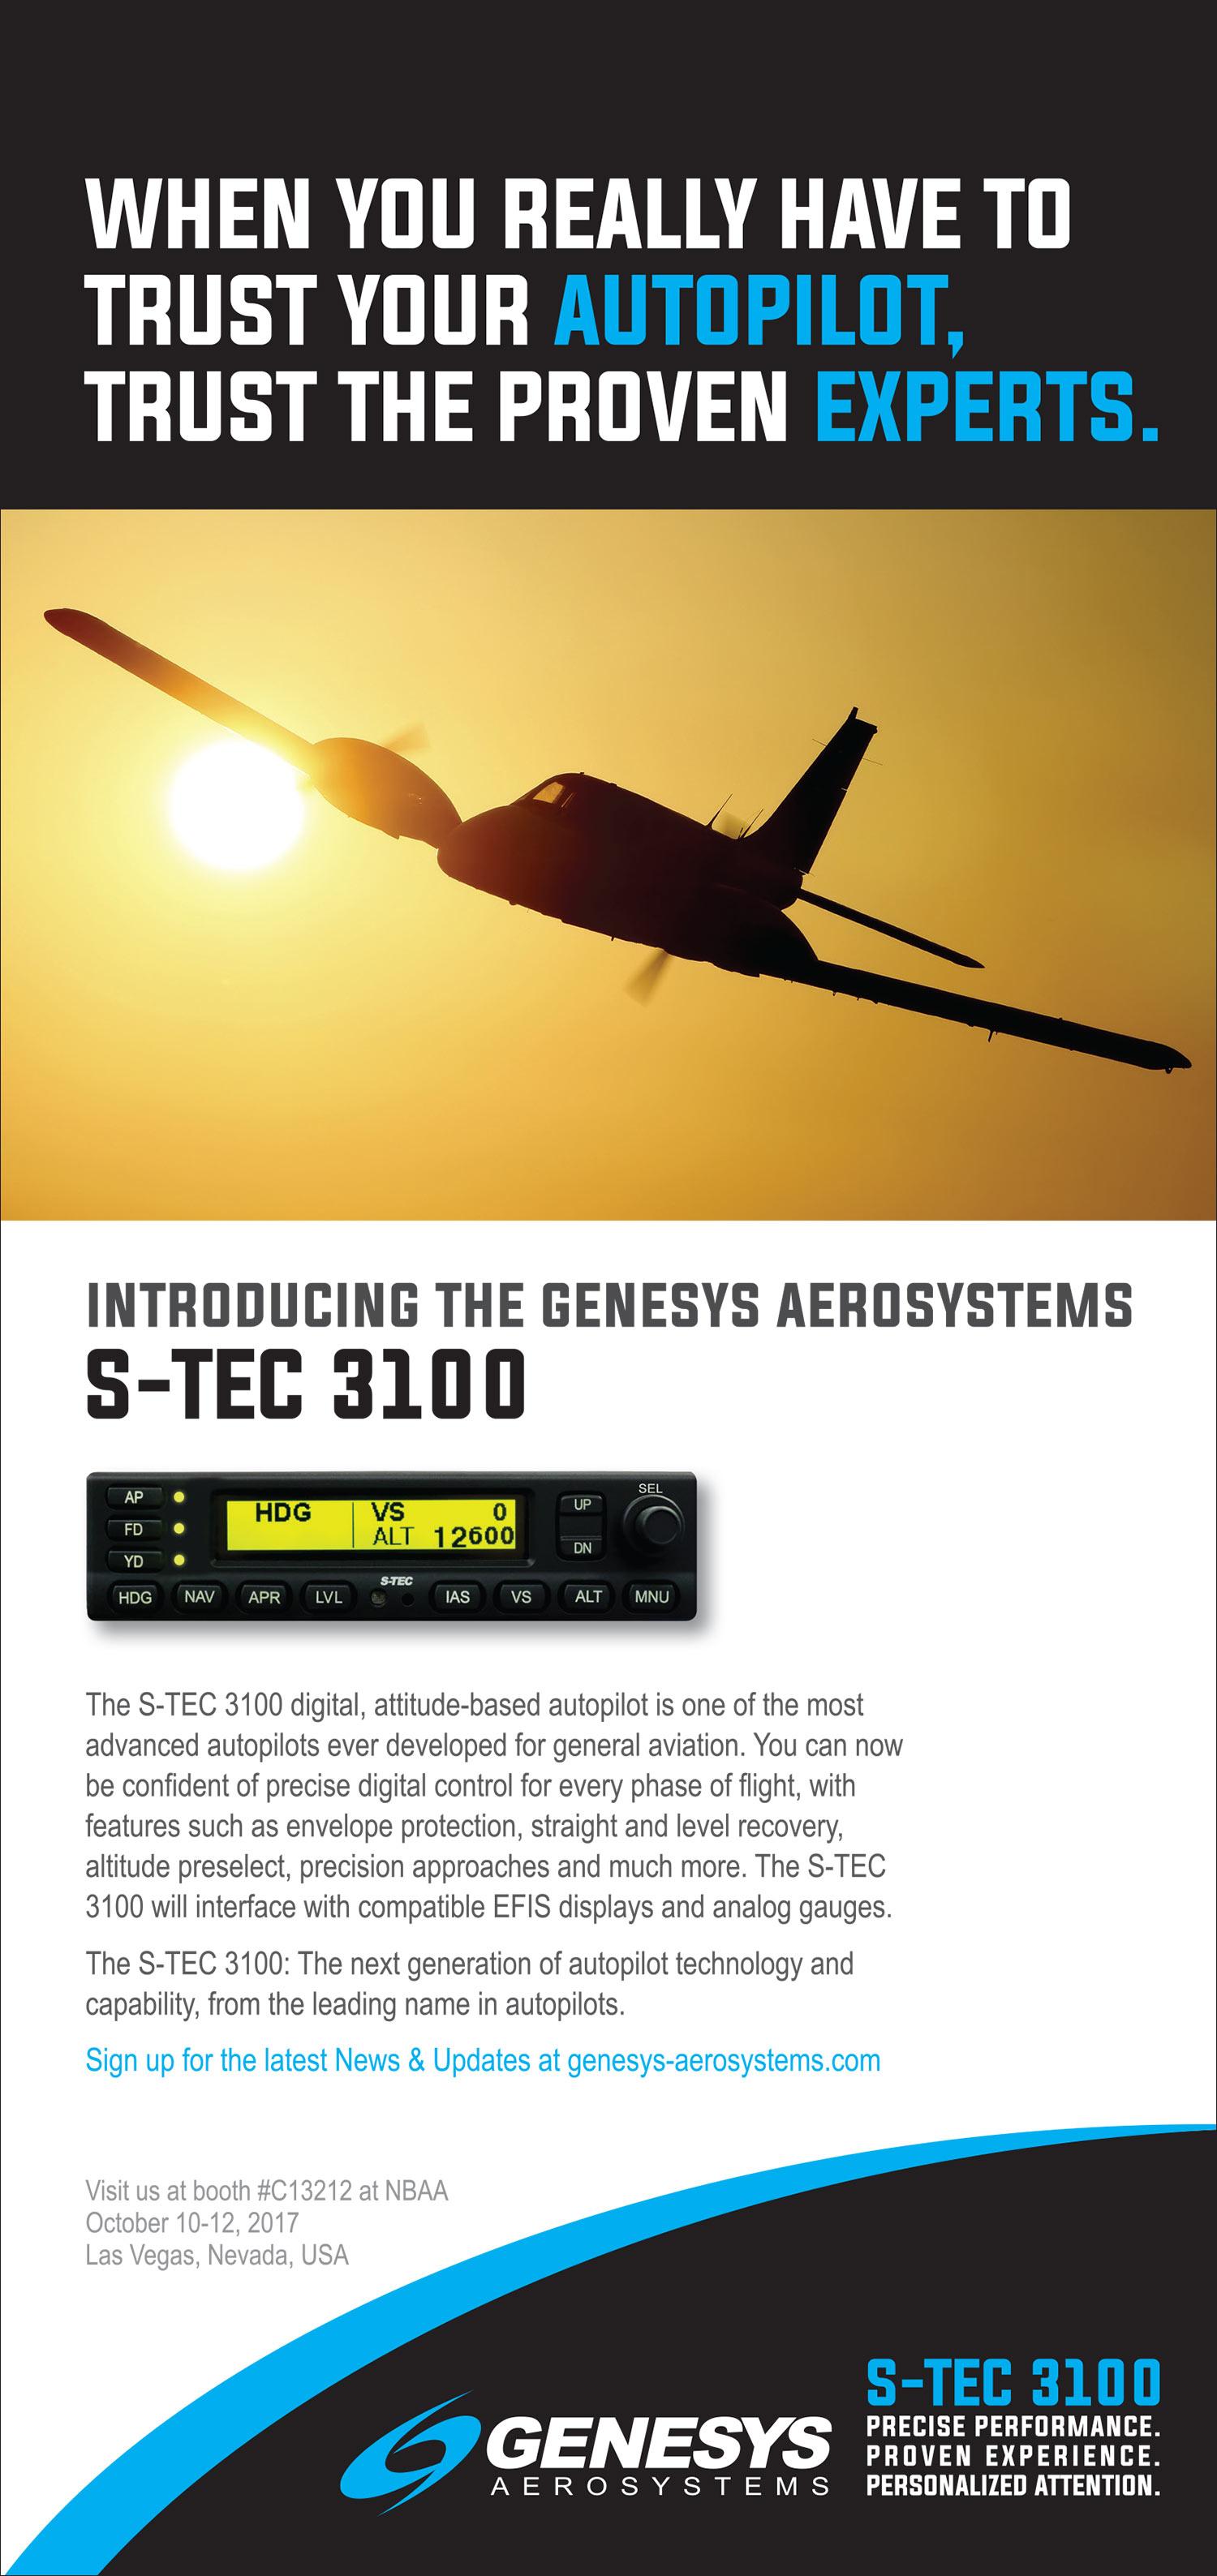 Genesys Aerosystems